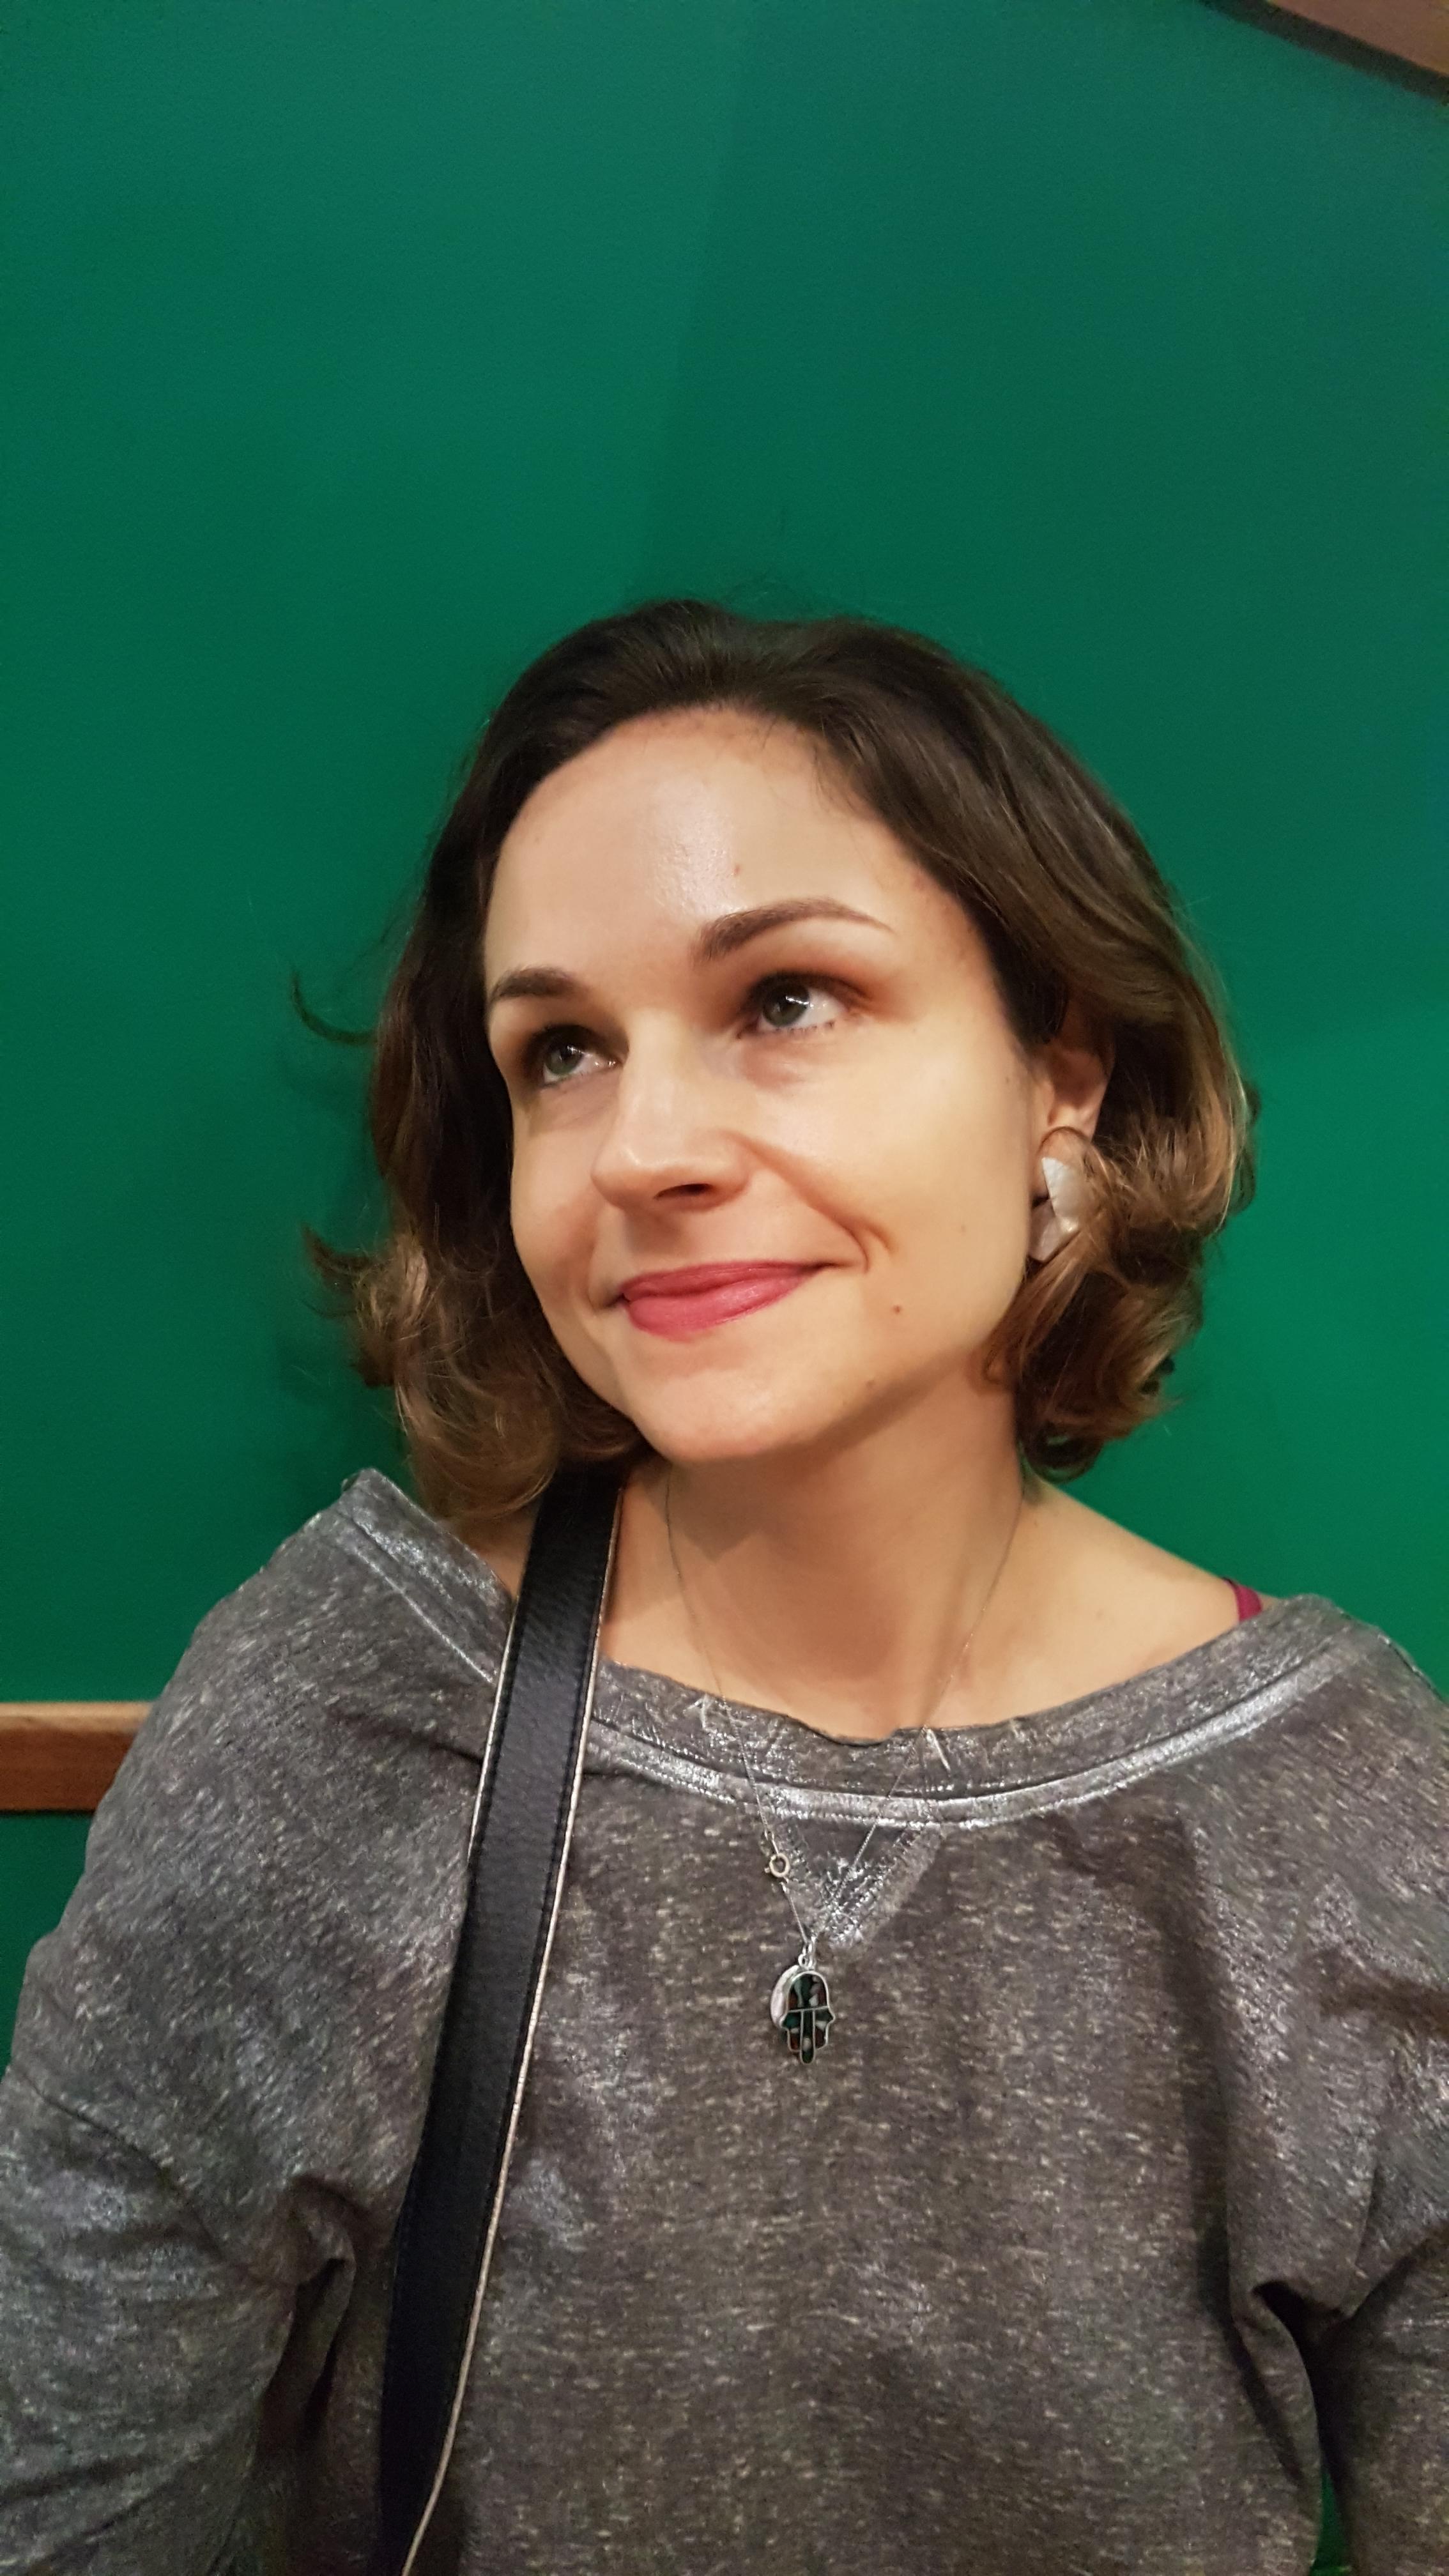 Isabel Brelaz Camargo